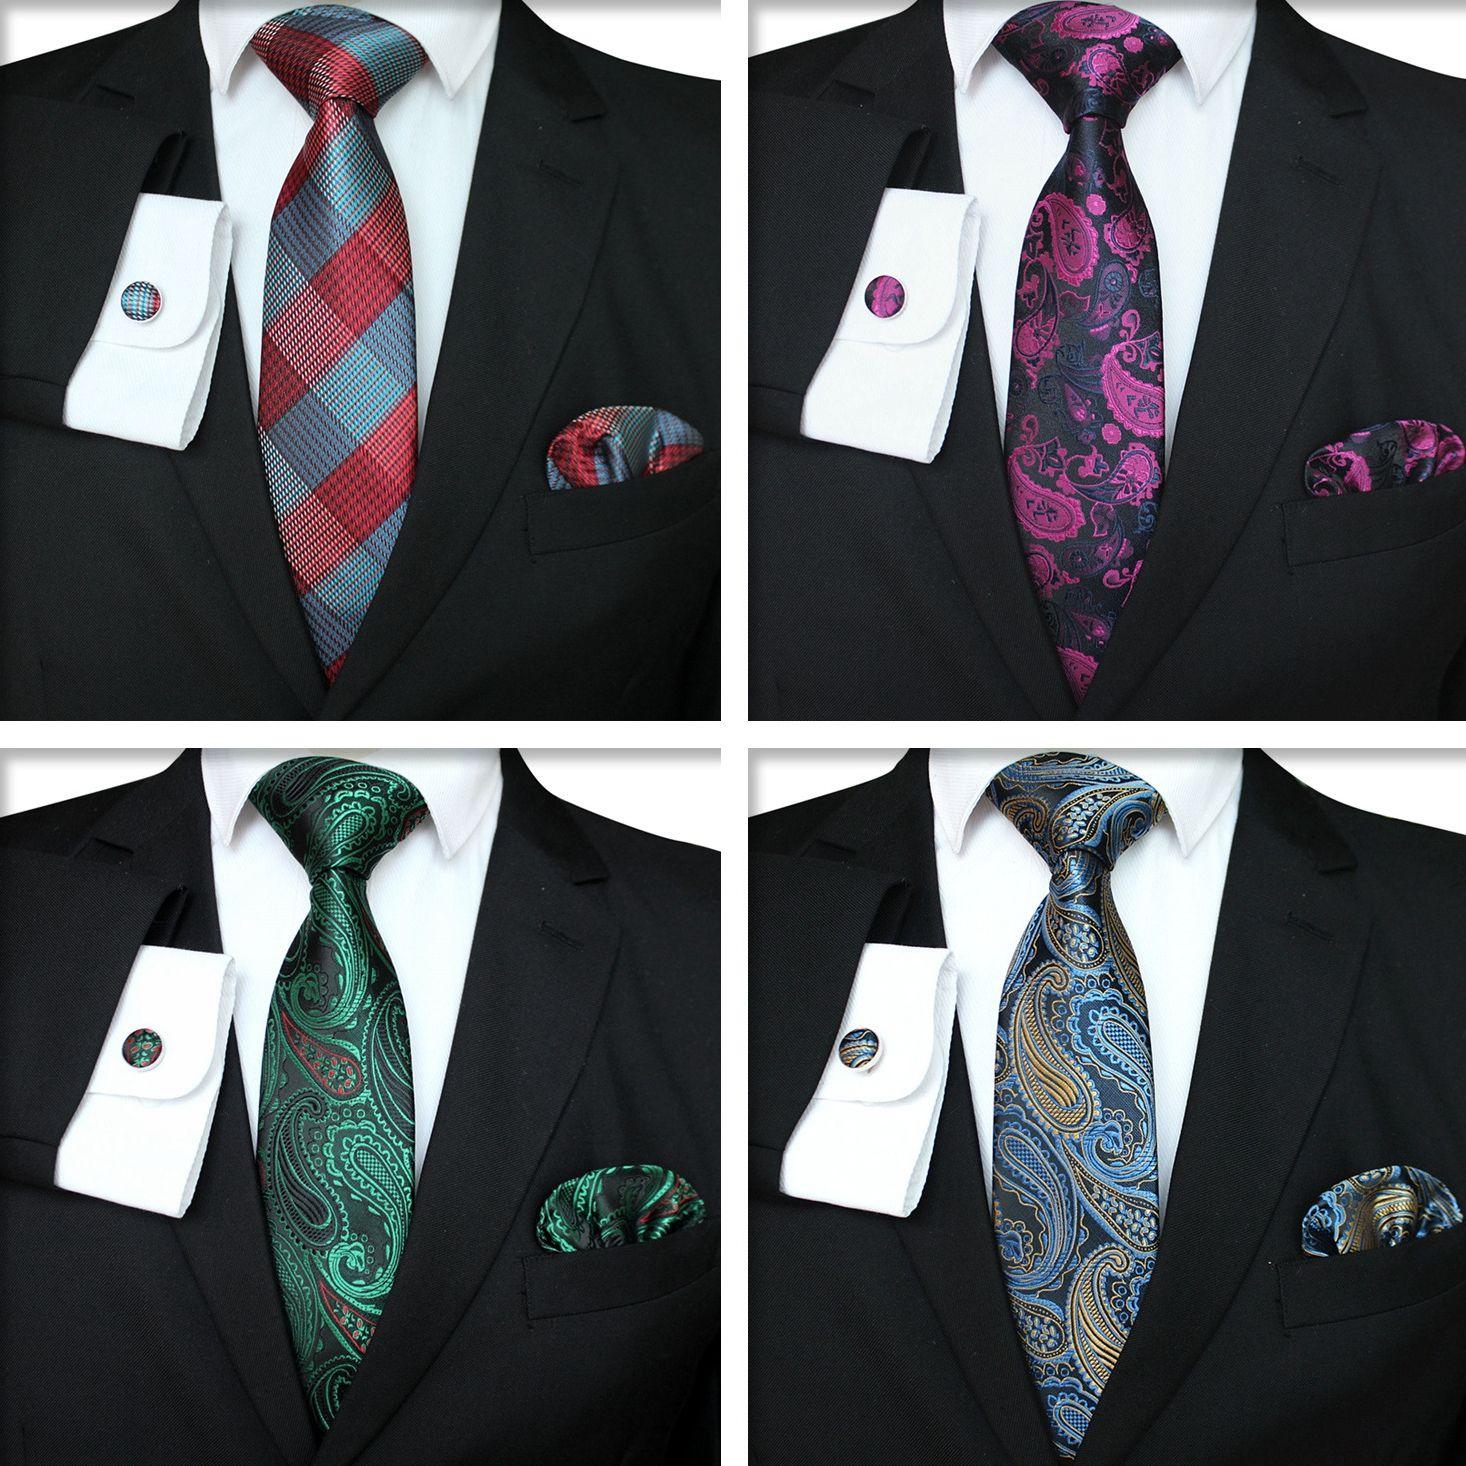 Plaid Series Tie Set Mode Herren klassische Silk Hanky Cufflinks Jacquard Woven Krawatte Männer Business Tie Set TTA-1116